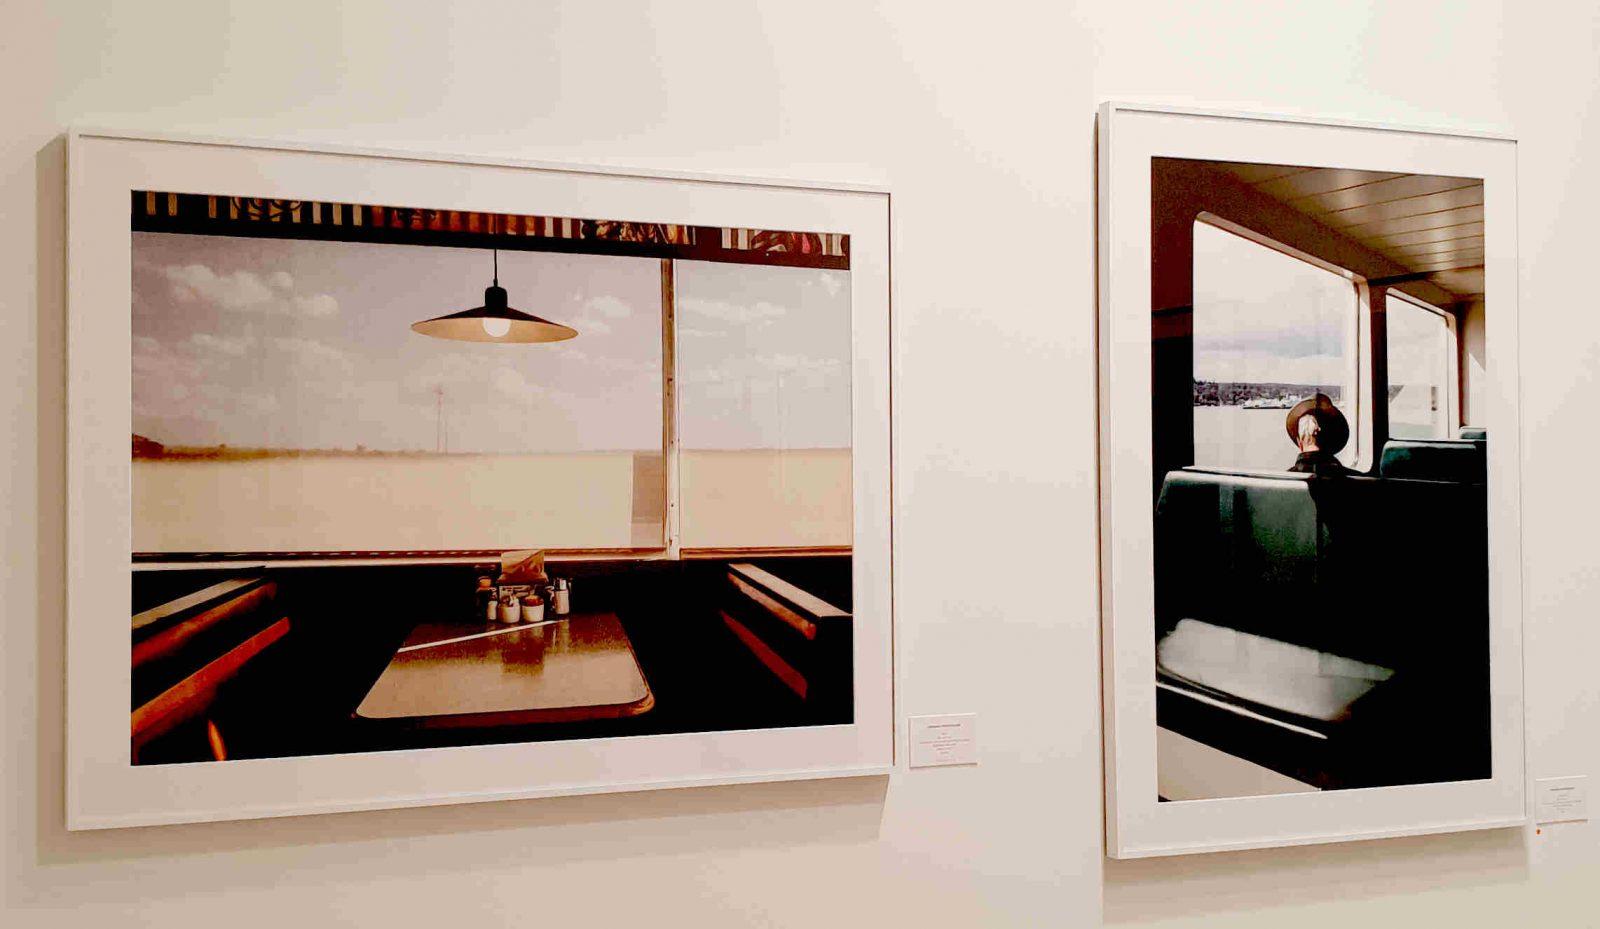 START Art Fair, Saatchi Gallery, art exhibition London, art collector, emerging artists, most popular exhibitions